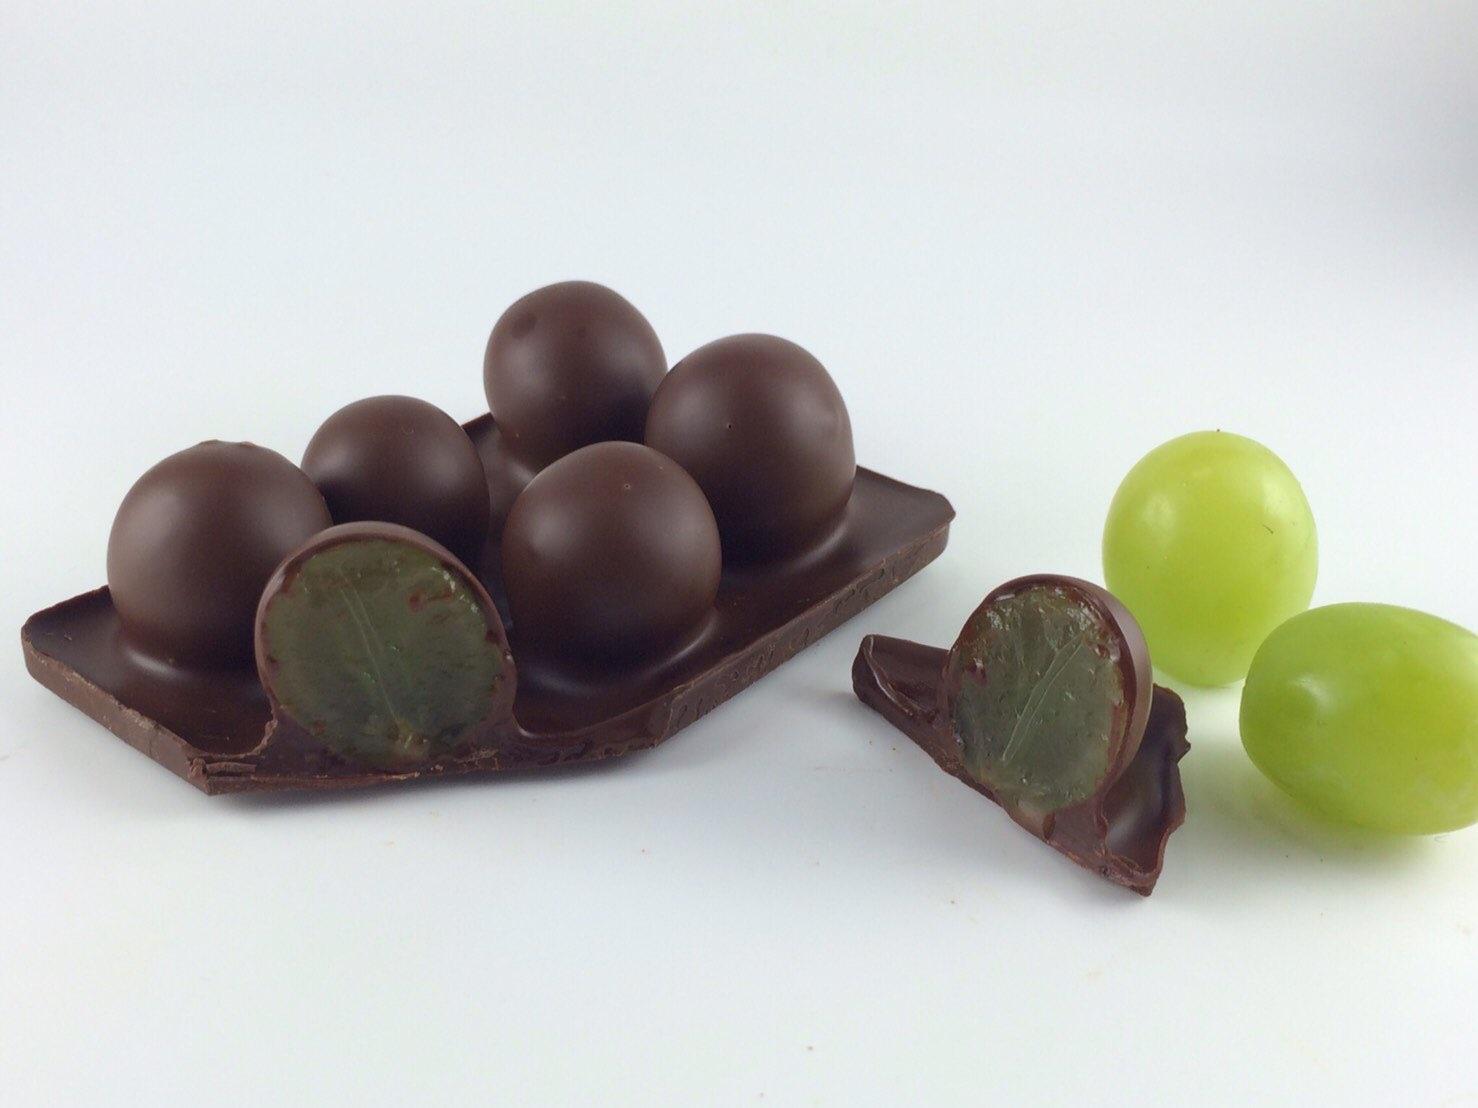 %e6%b8%8b%e8%b0%b7%e3%82%b9%e3%82%af%e3%83%a9%e3%83%b3%e3%83%96%e3%83%ab%e3%82%b9%e3%82%af%e3%82%a8%e3%82%a2-shibuya-scramble-square-autumn-fruity-desserts-%e7%94%9c%e9%bb%9e5-2